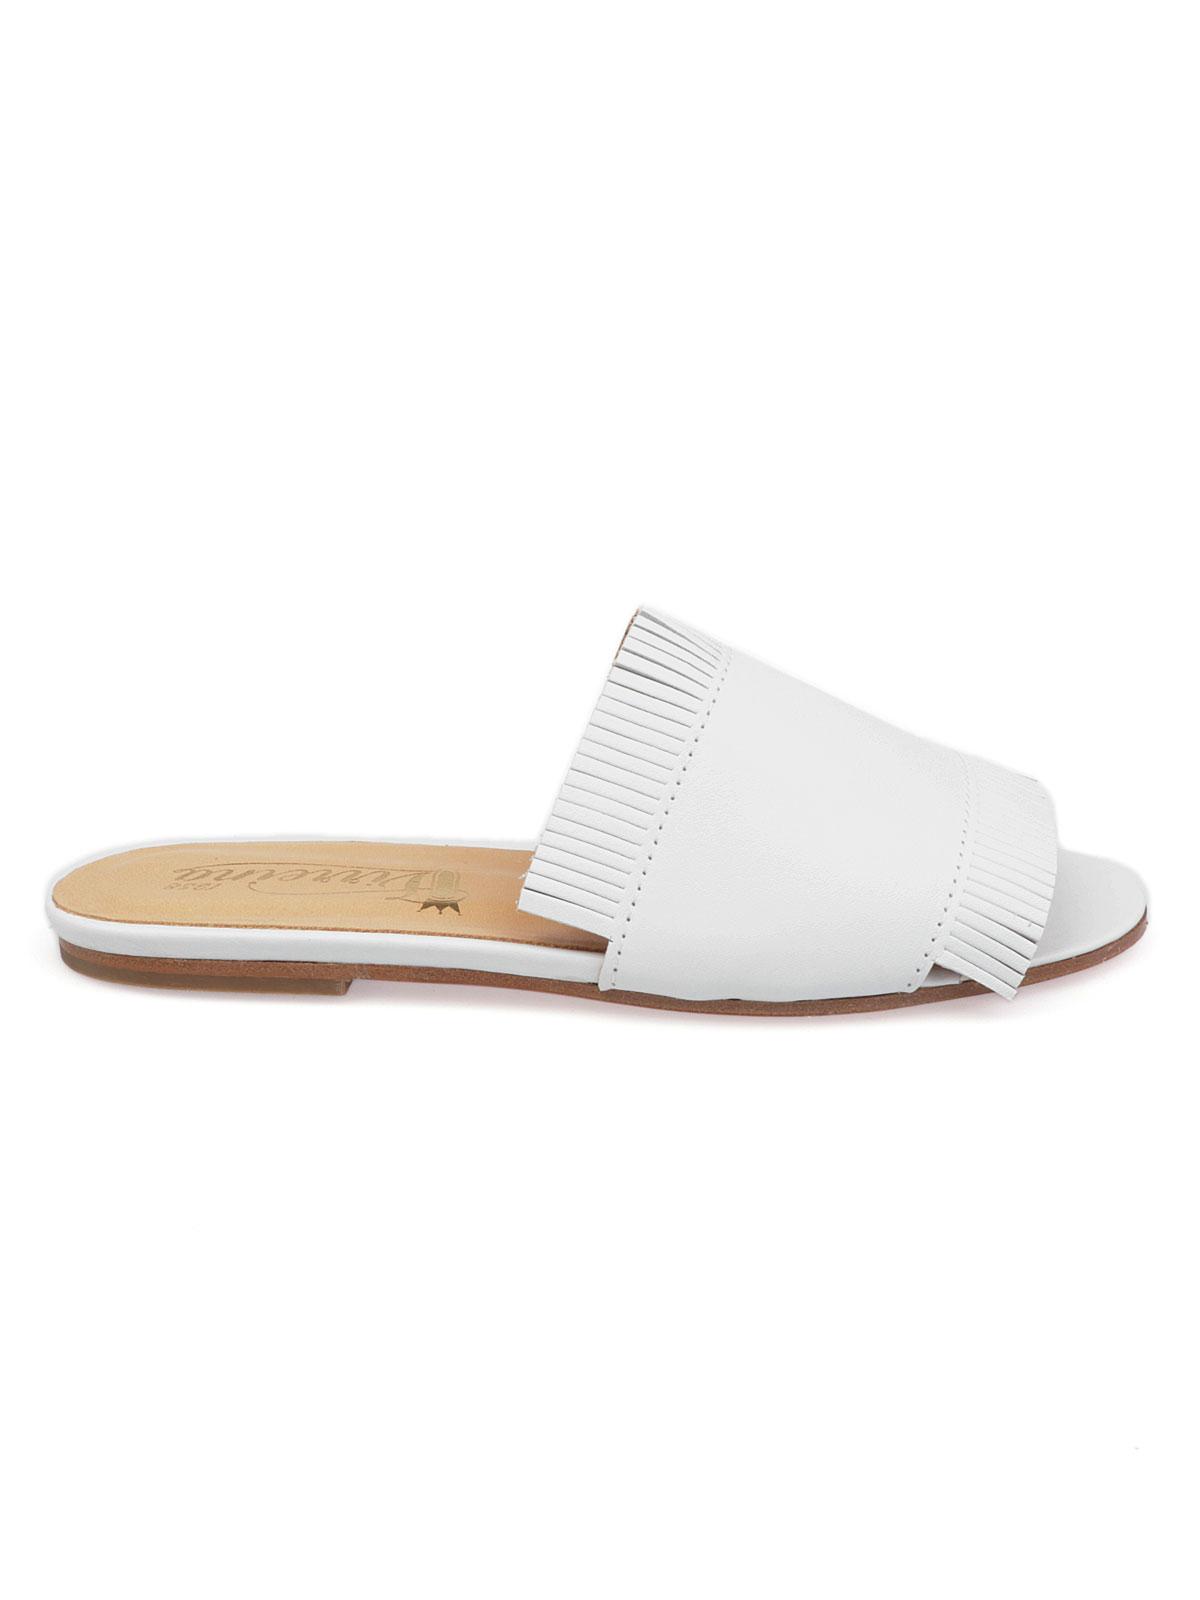 Immagine di Virreina | Footwear Nina